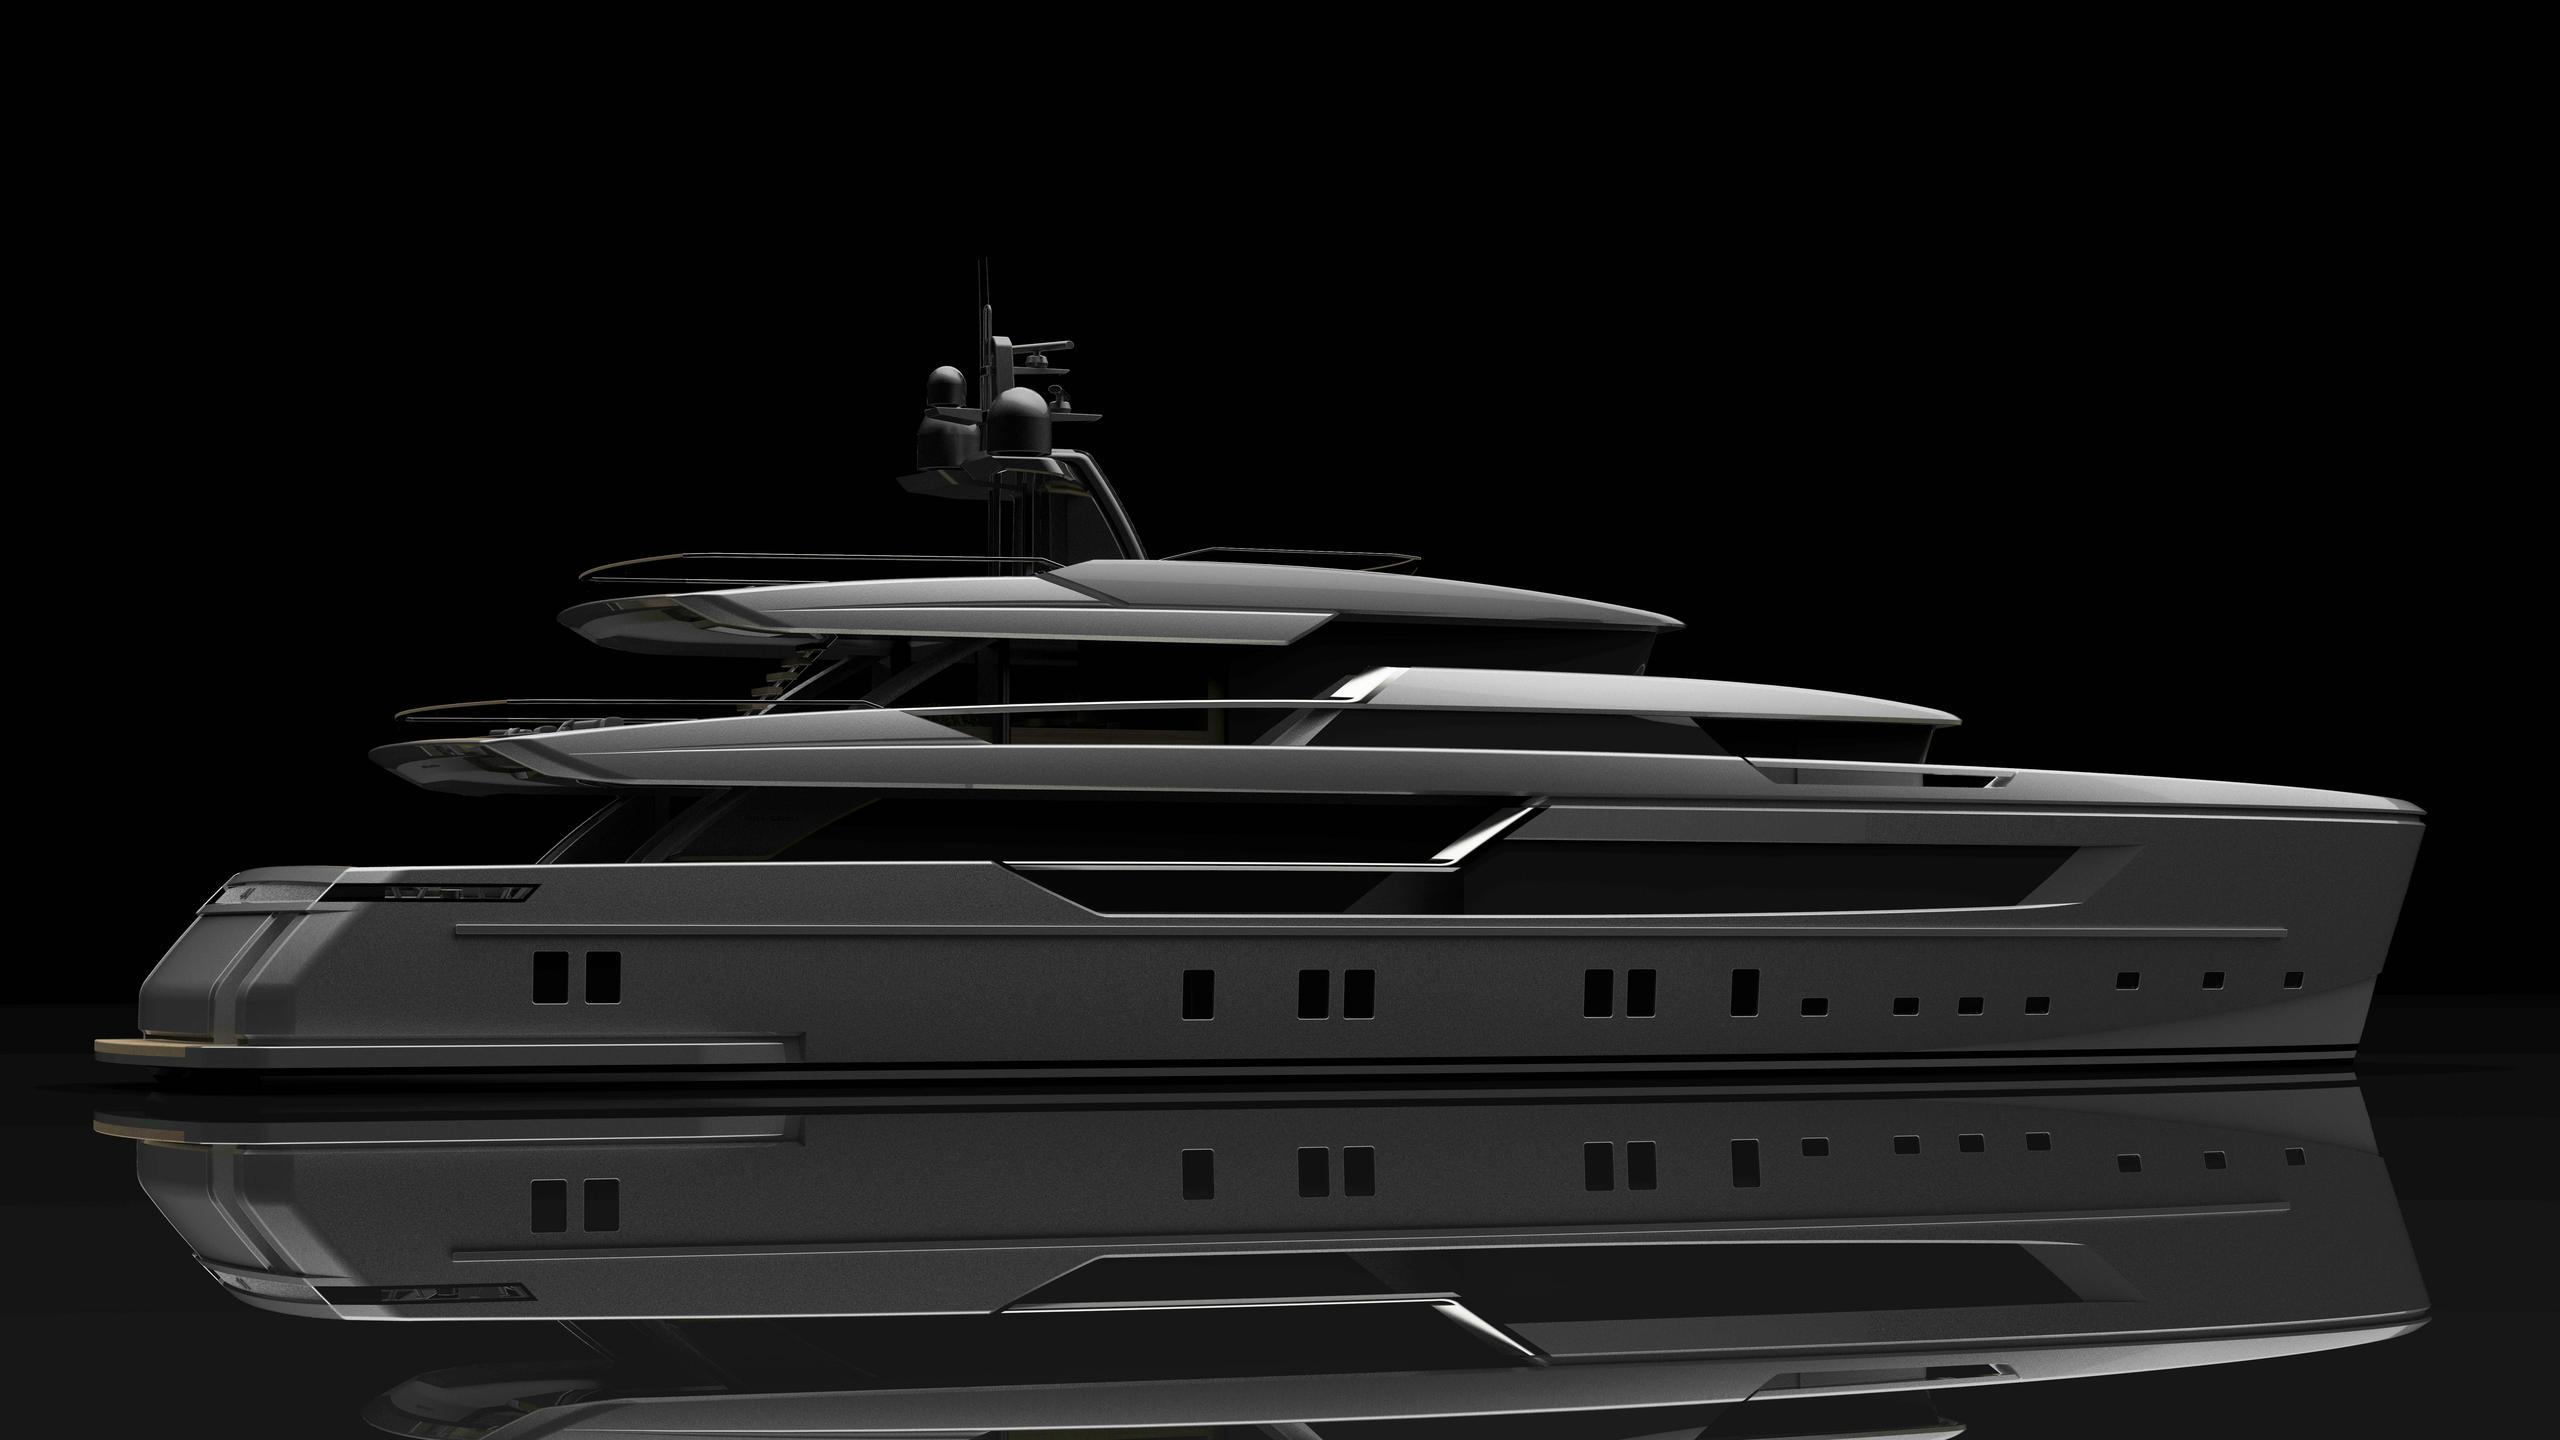 sl-44 alloy motoryacht sanlorenzo 44m 2020 rendering sistership